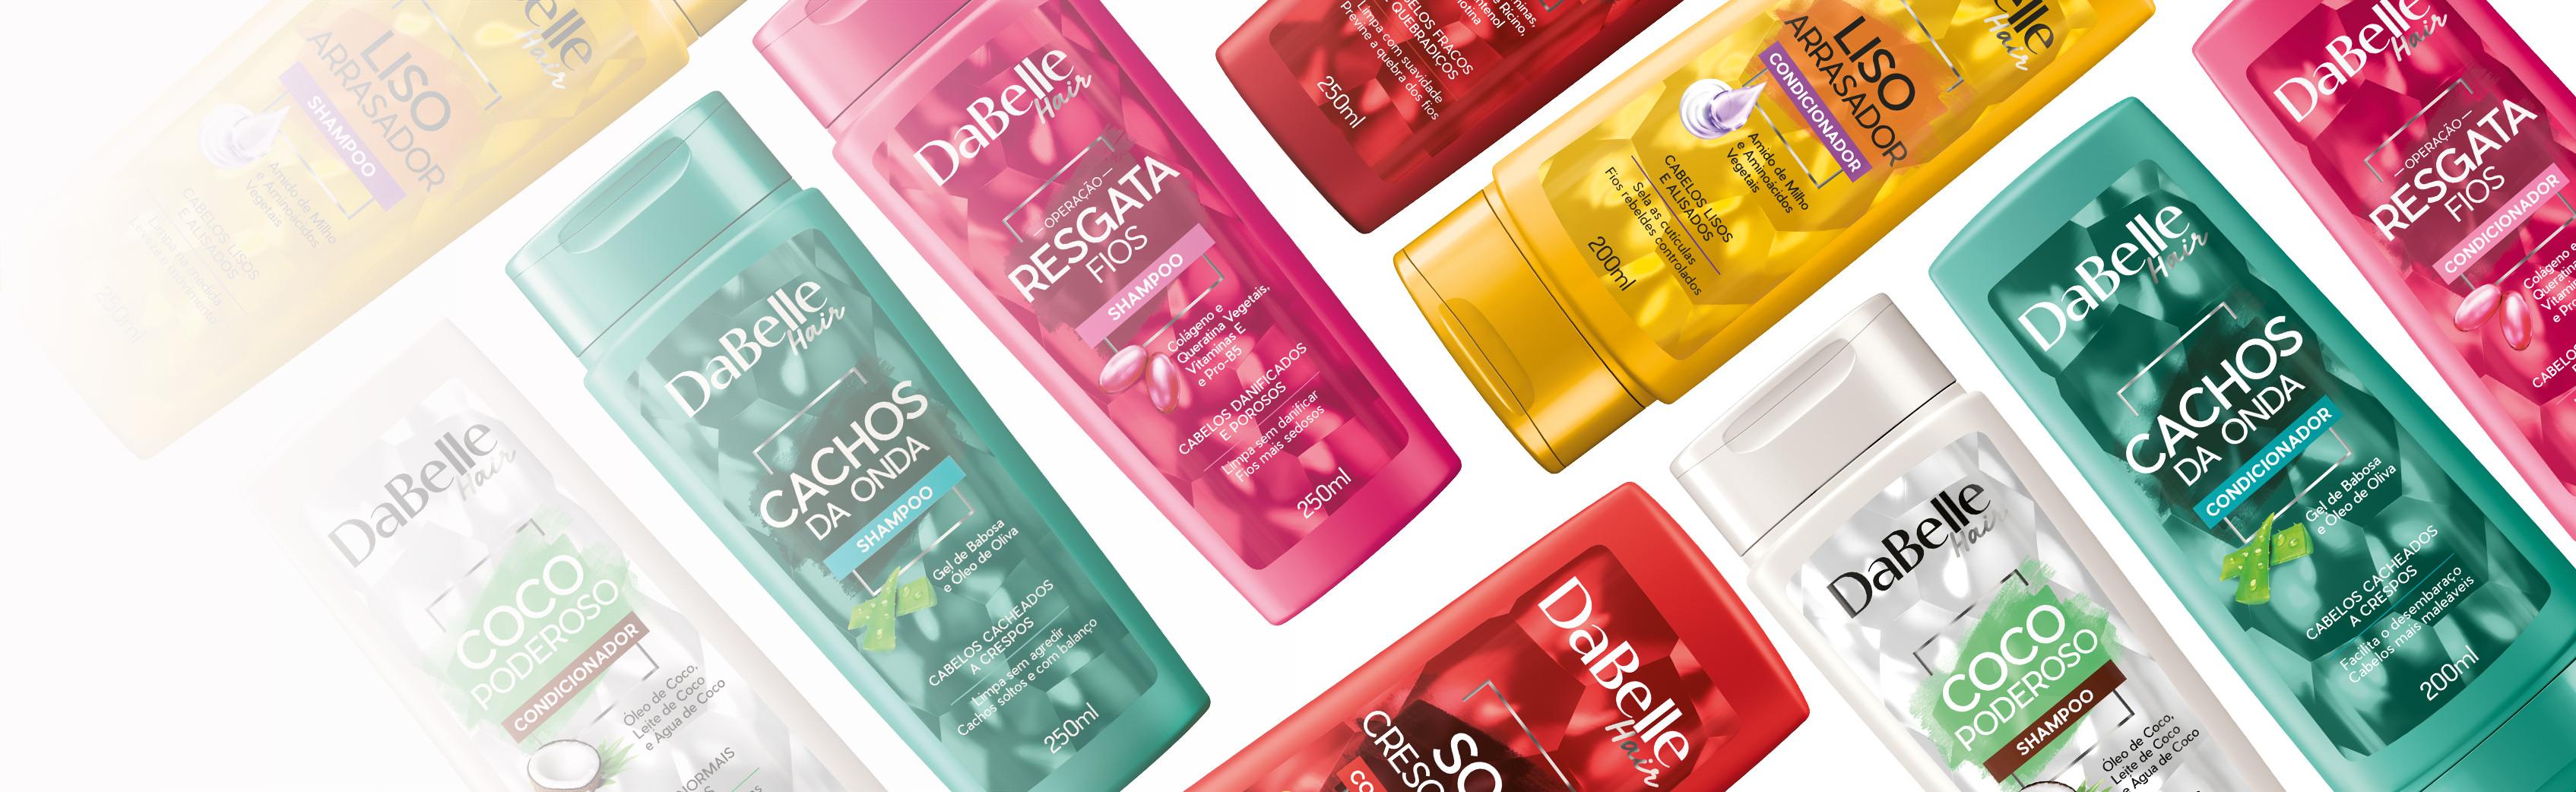 Kits de tratamento para cabelo